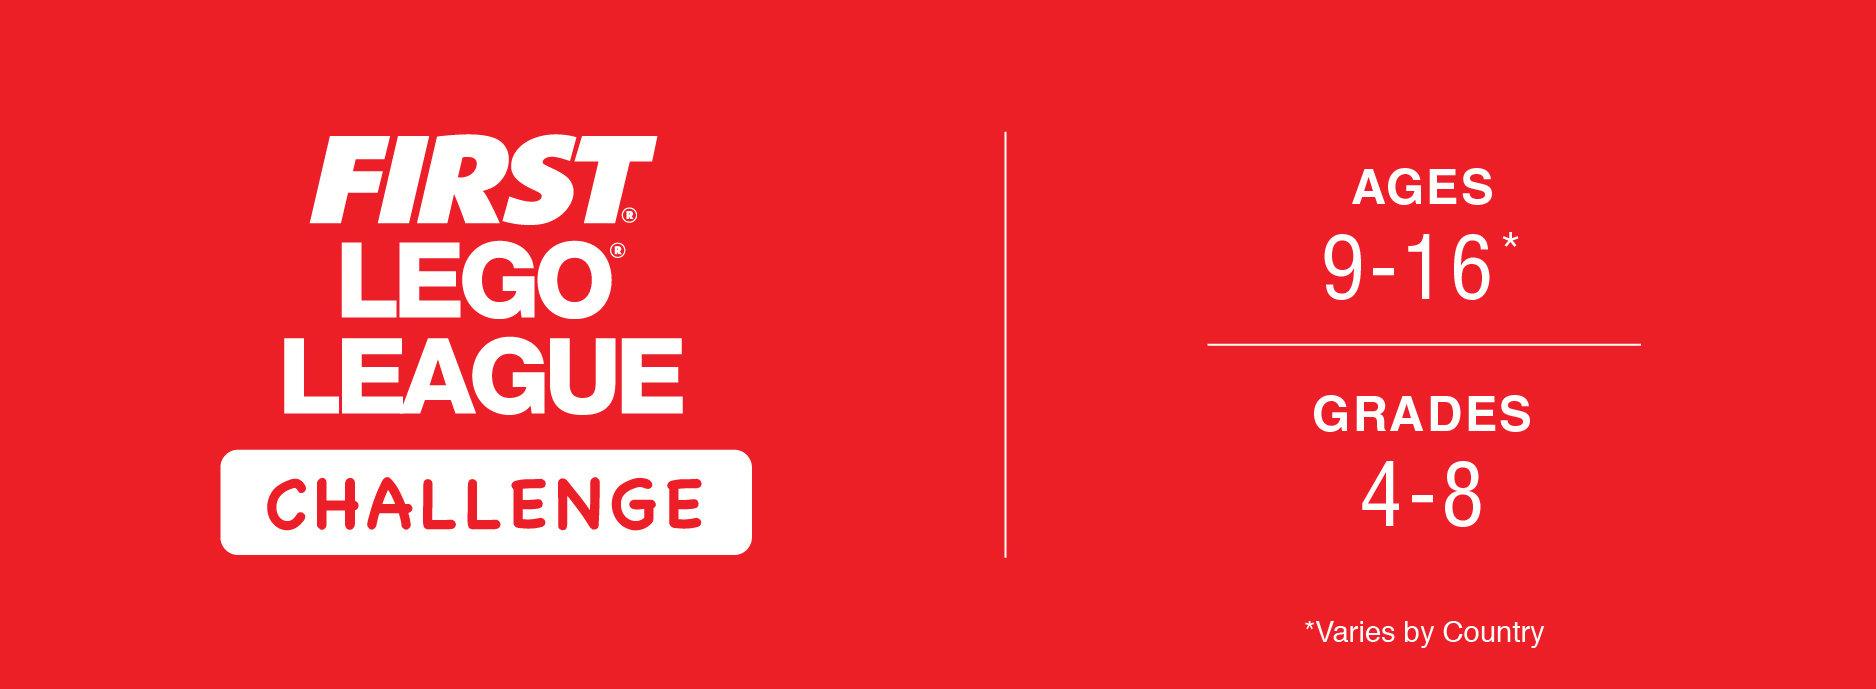 FIRST LEGO League Banner